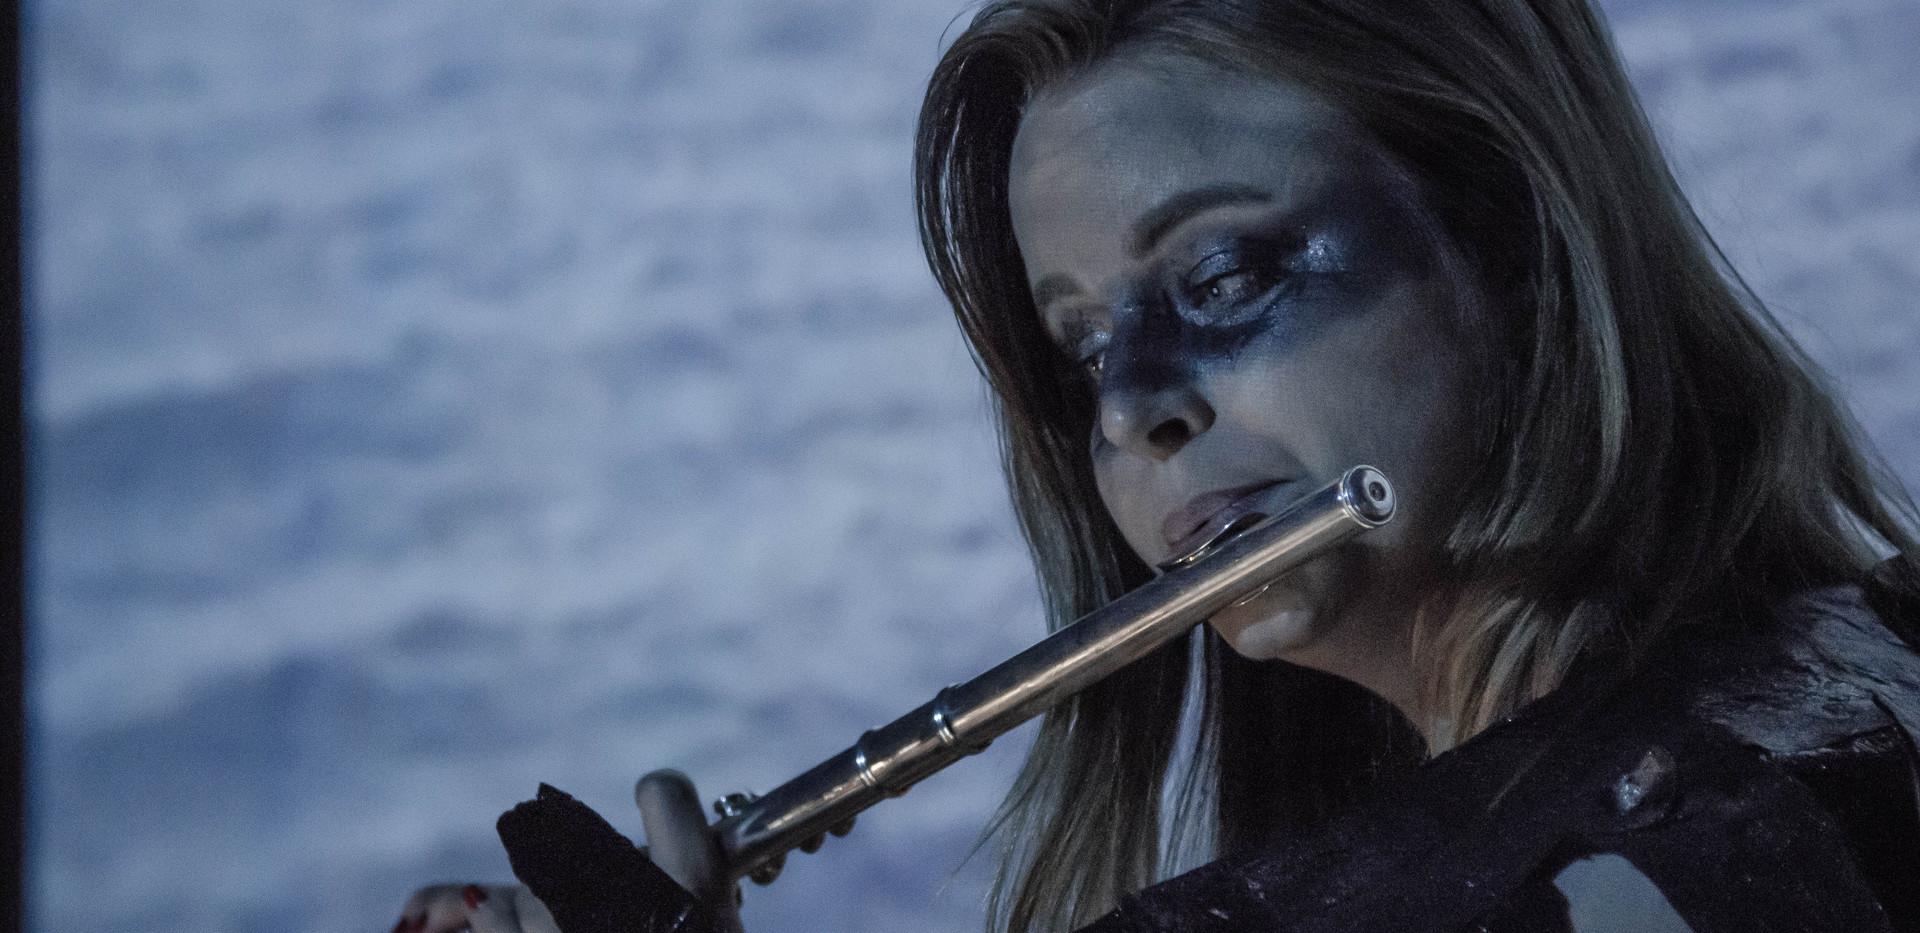 Erin in performance